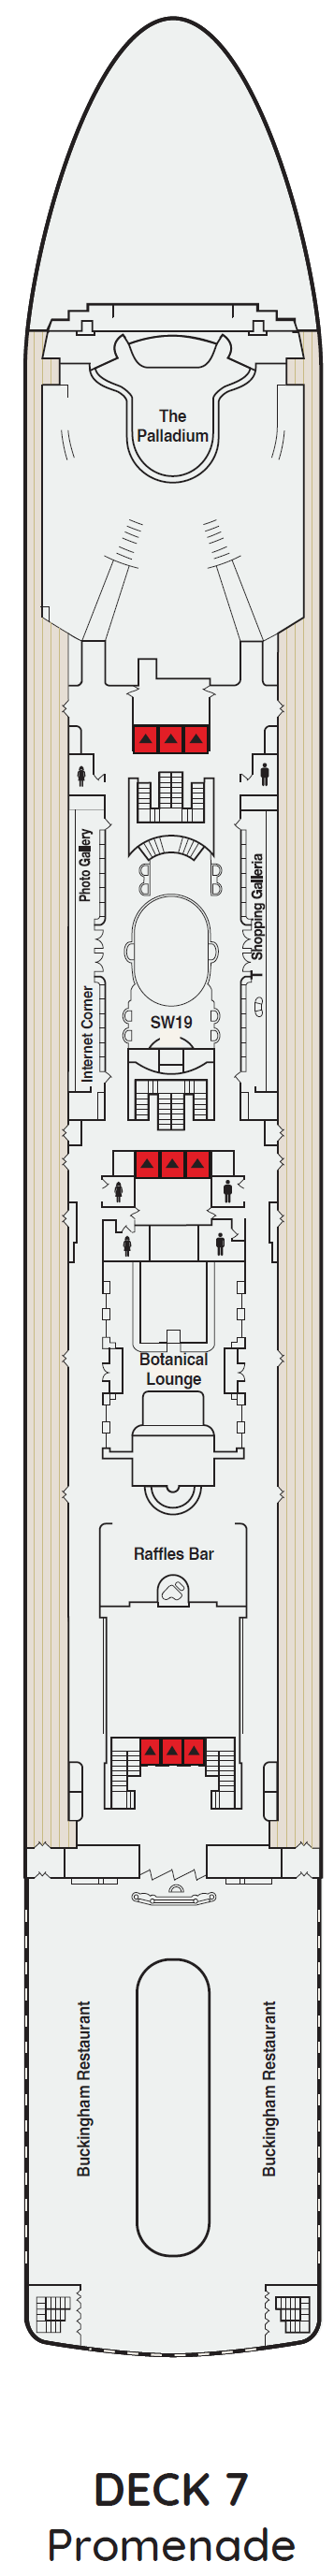 Ambience Promenade Deck 7